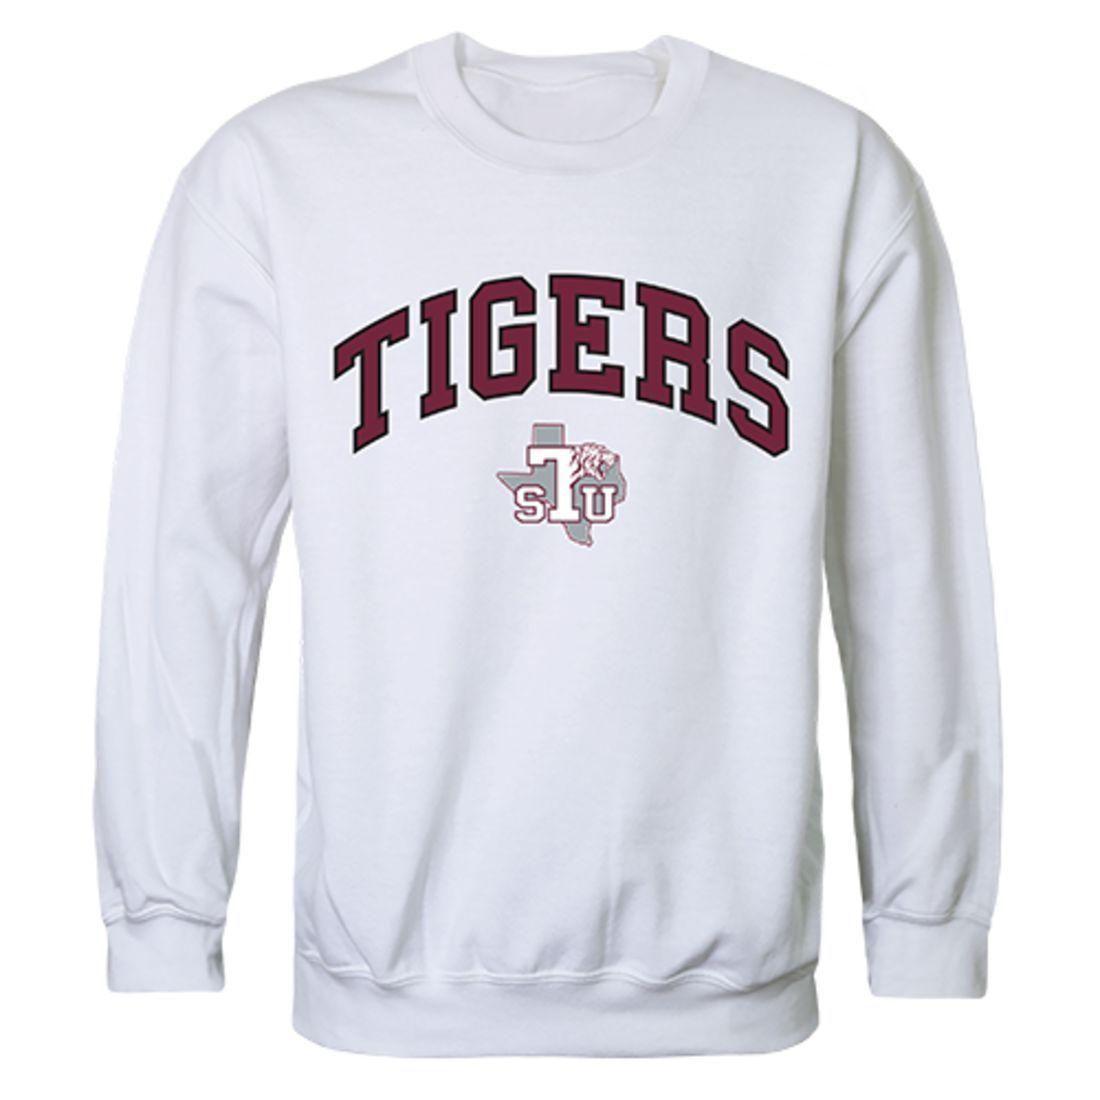 Teedcma Tsu Texas Southern University Campus Crewneck Pullover Sweatshirt Sweater White 315 Gift For Men W Sweatshirt Sweater Sweatshirts Pullover Sweatshirt [ 1100 x 1100 Pixel ]